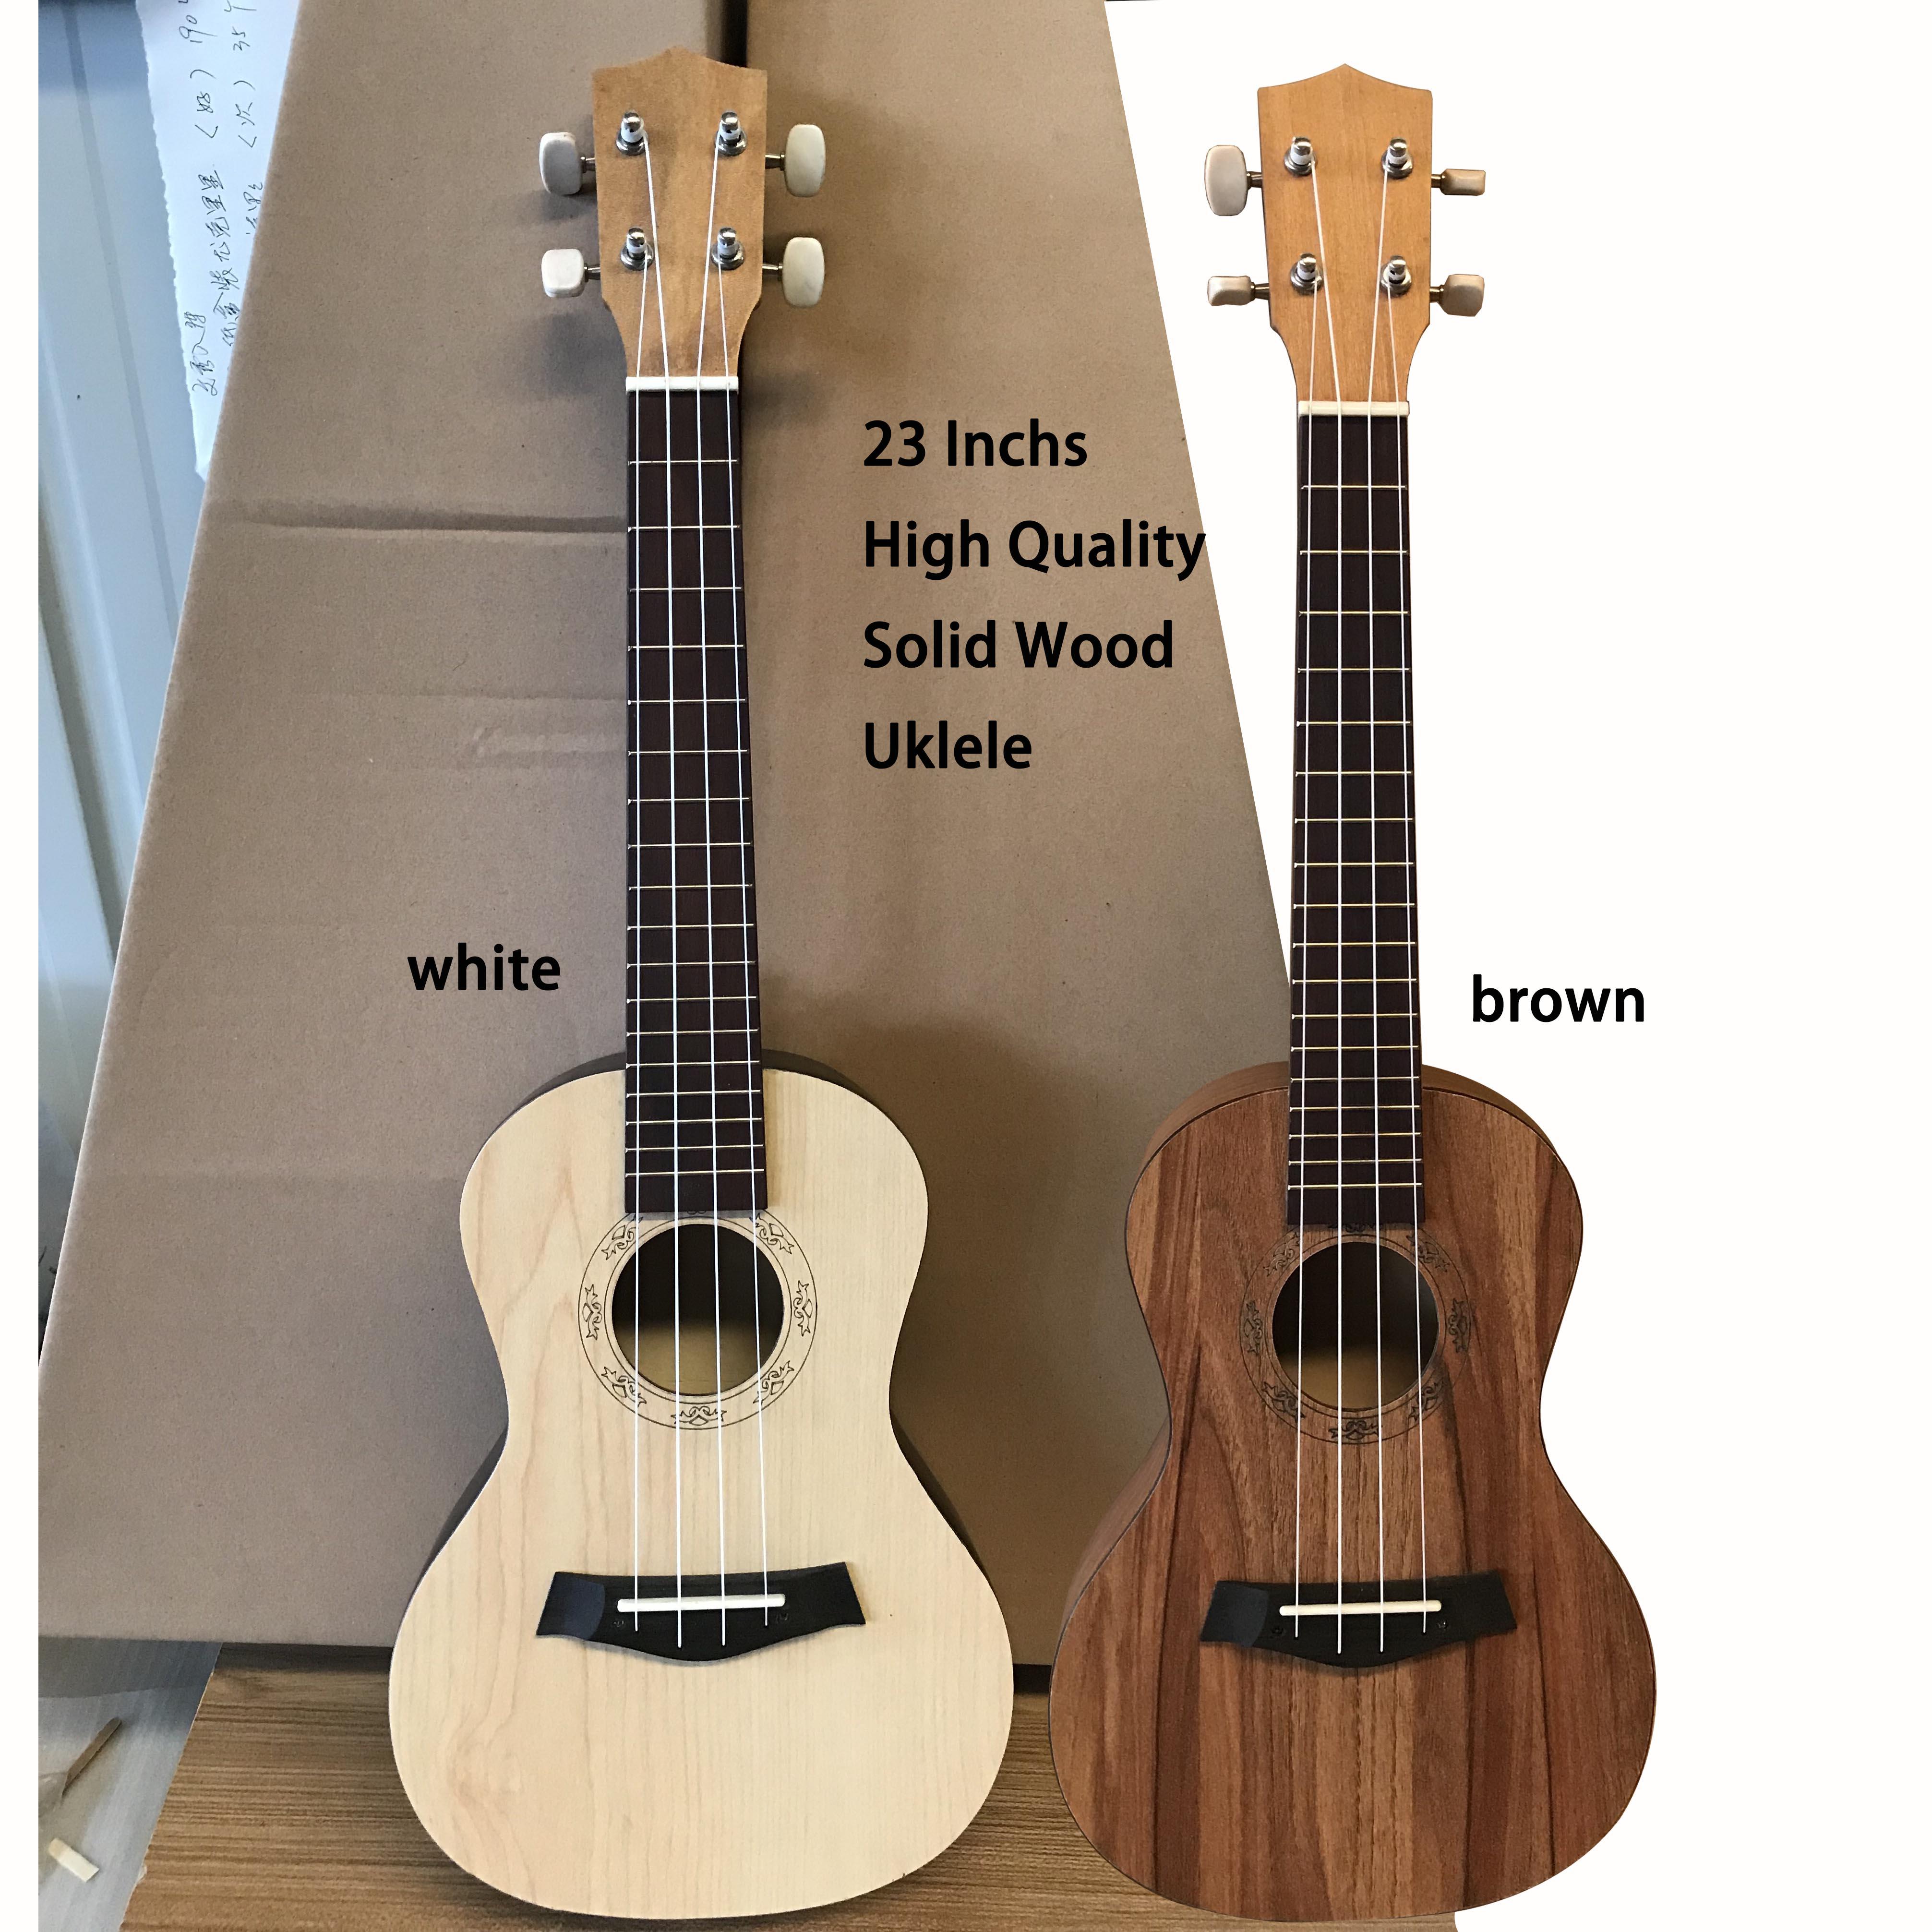 23inch Concert Ukulele Made of All Plywood Hawaii guitar Popular Wood Conerless 23inch little guitar light matte